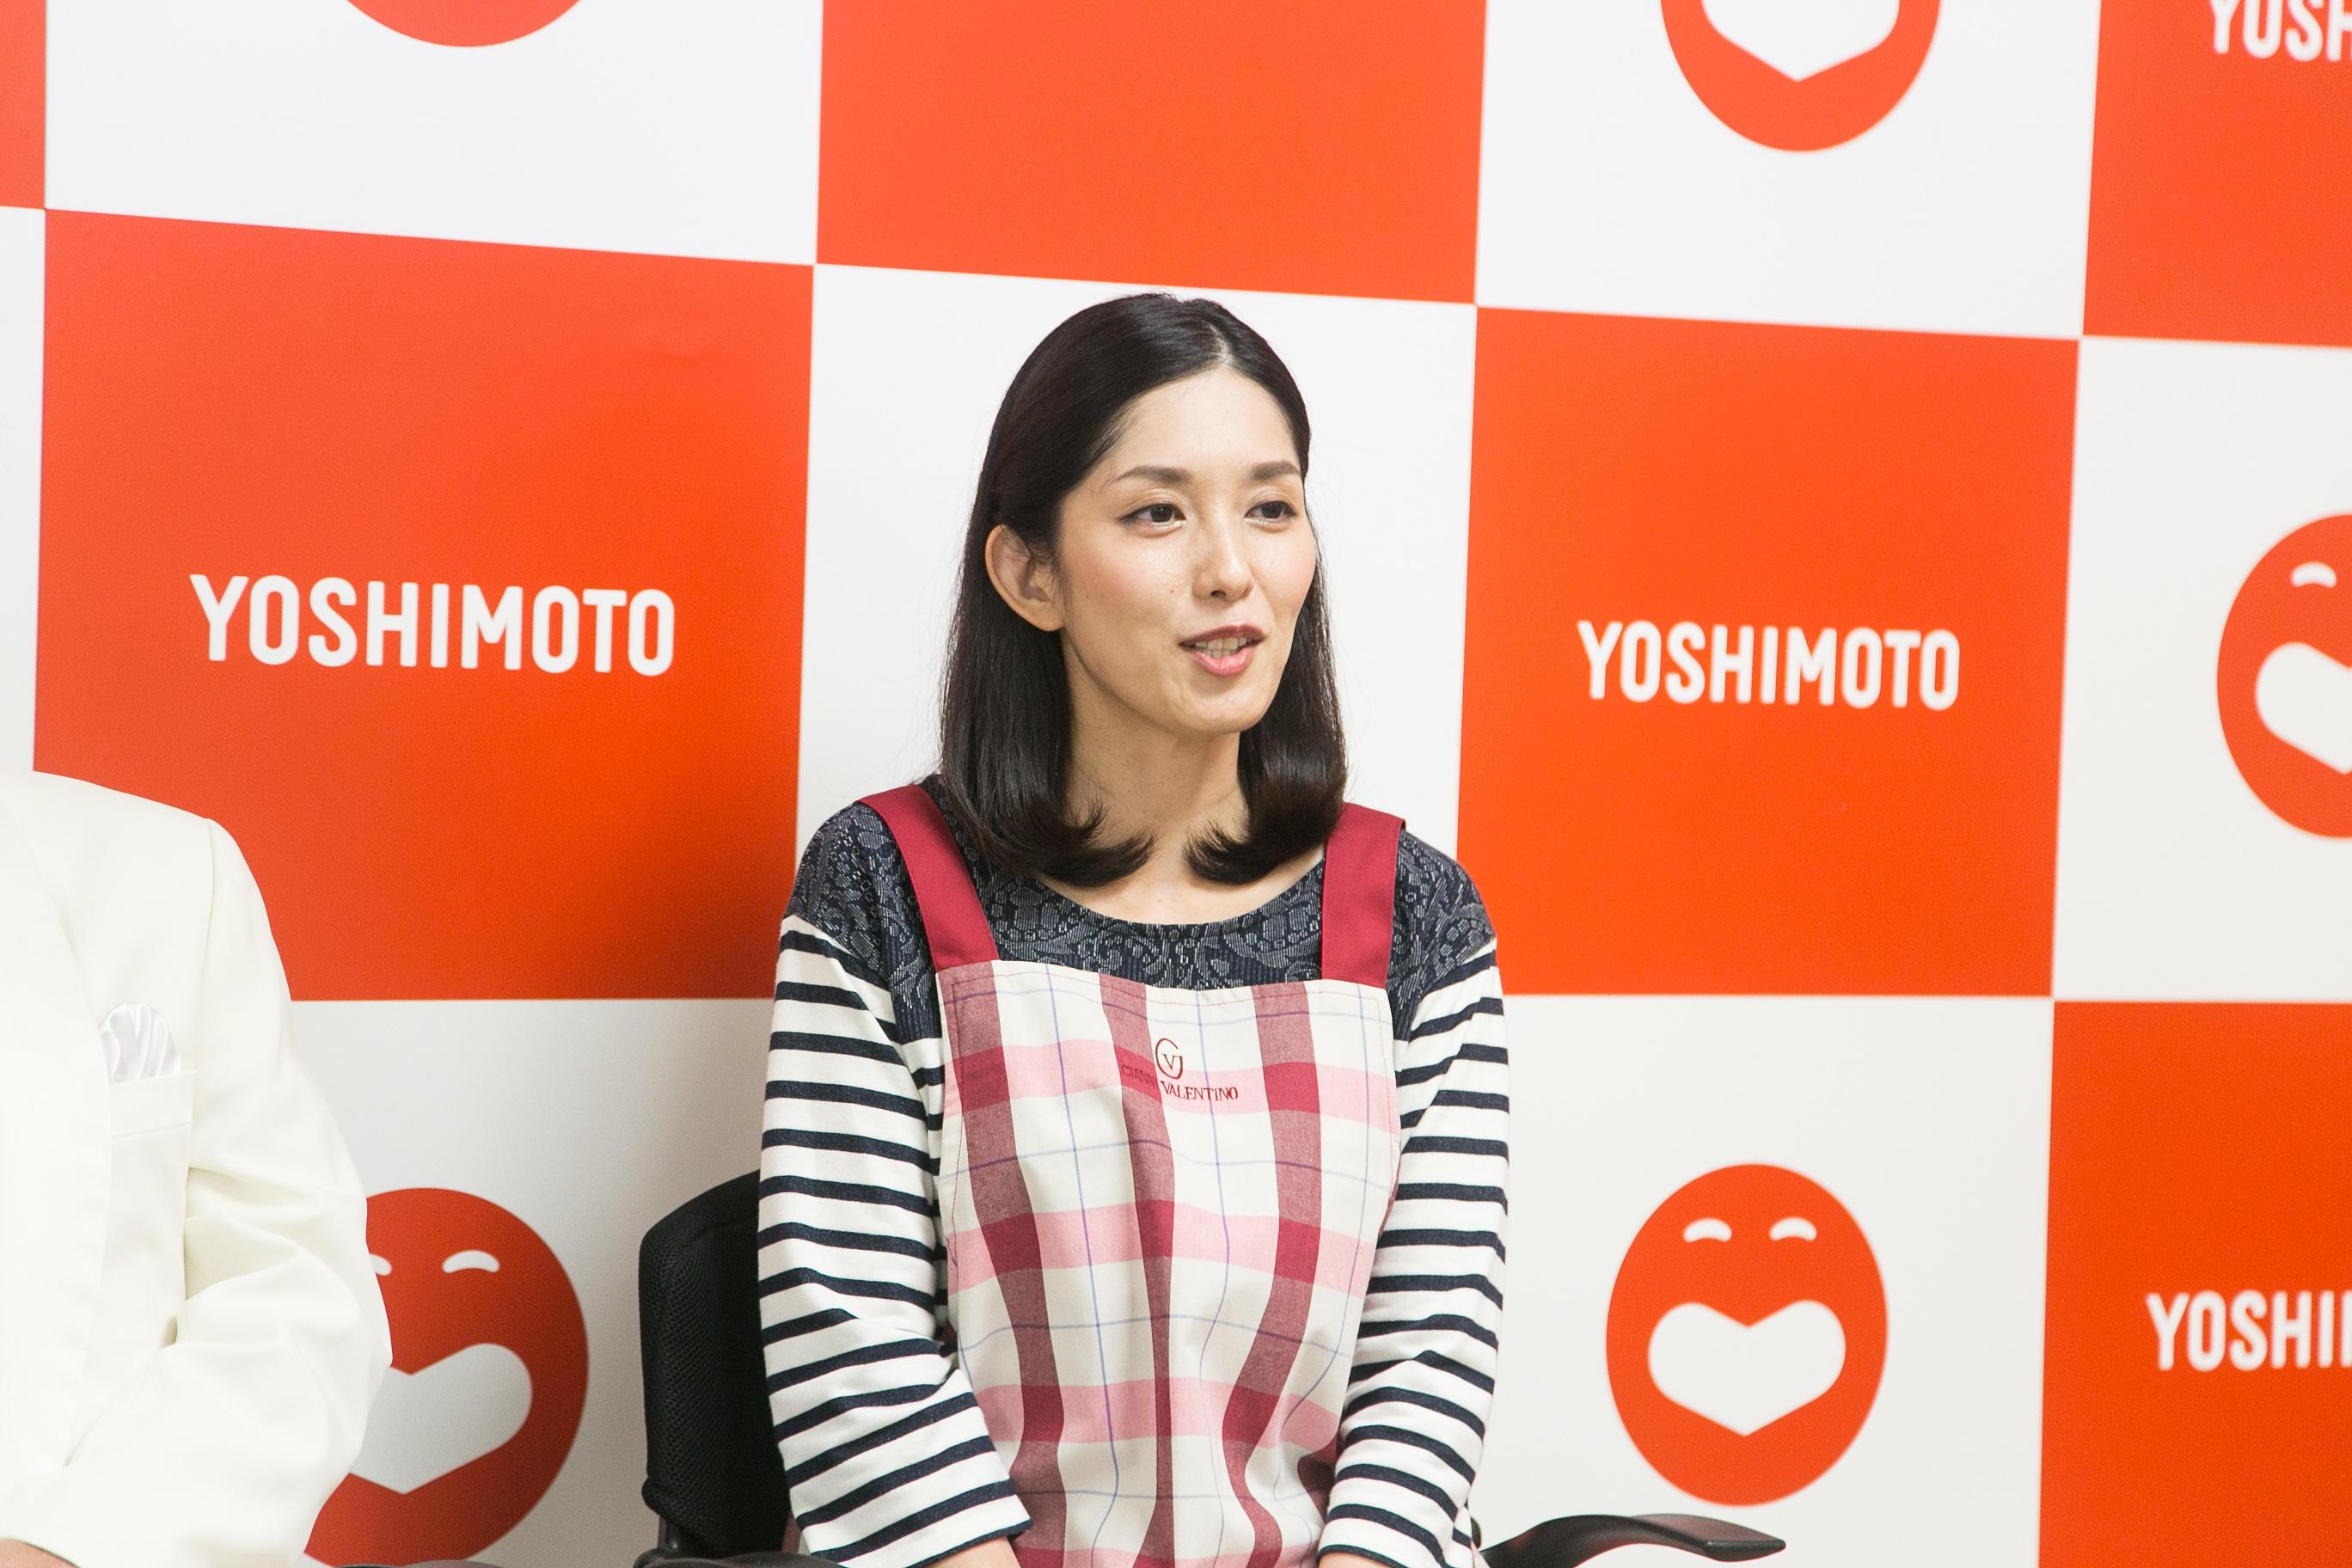 http://news.yoshimoto.co.jp/20180914170812-7d87c59e09b2e04c7758aeabffe76d2f509947b0.jpg